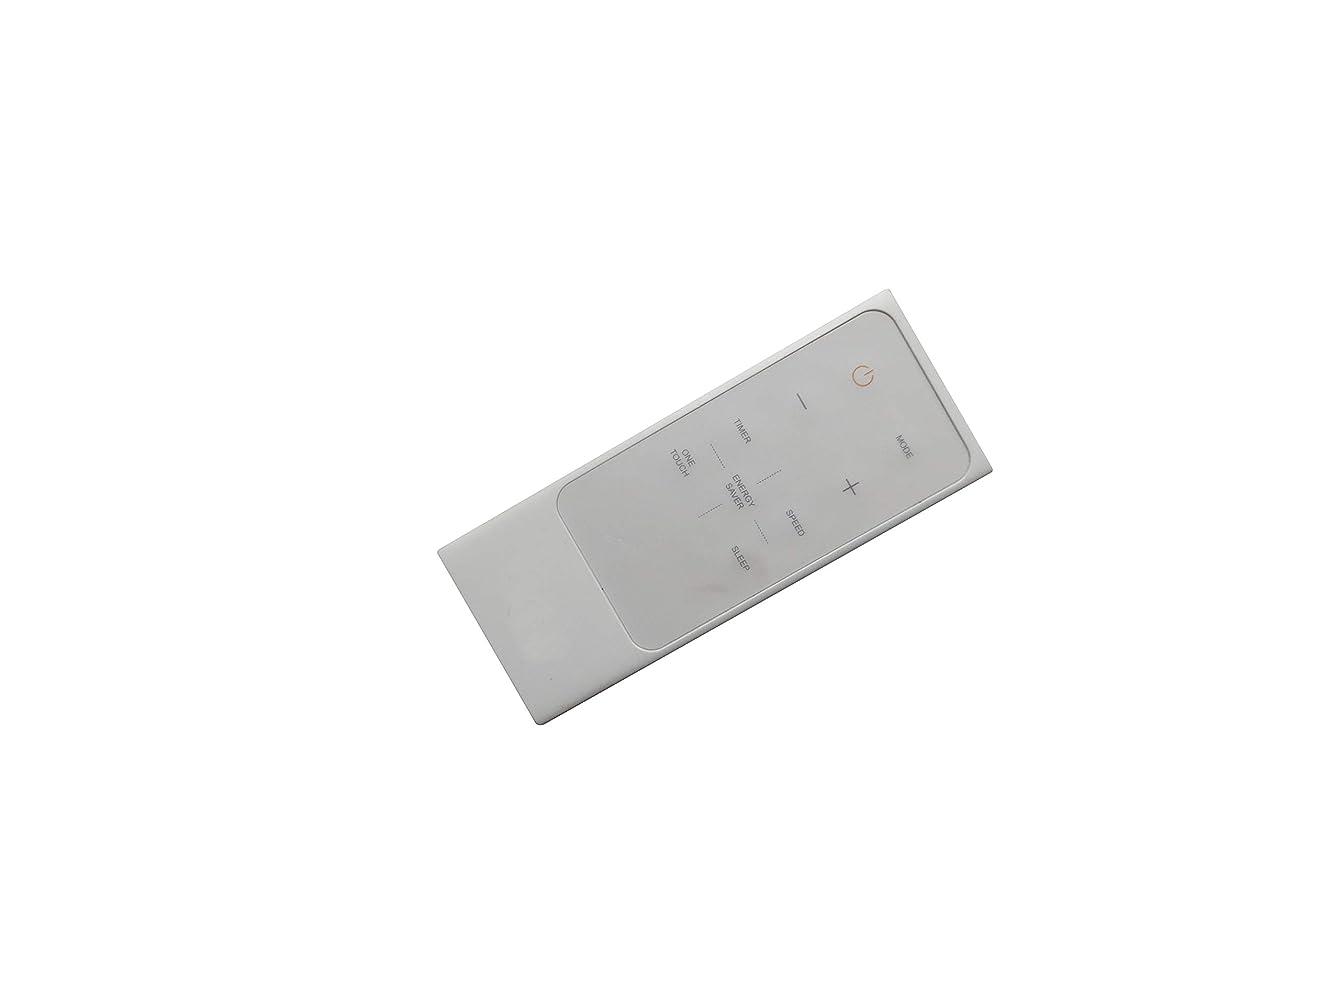 Remote Control for Surrey RG15A1/E RG15A2/E RG15B/E RG15A/E Room Air Conditioner